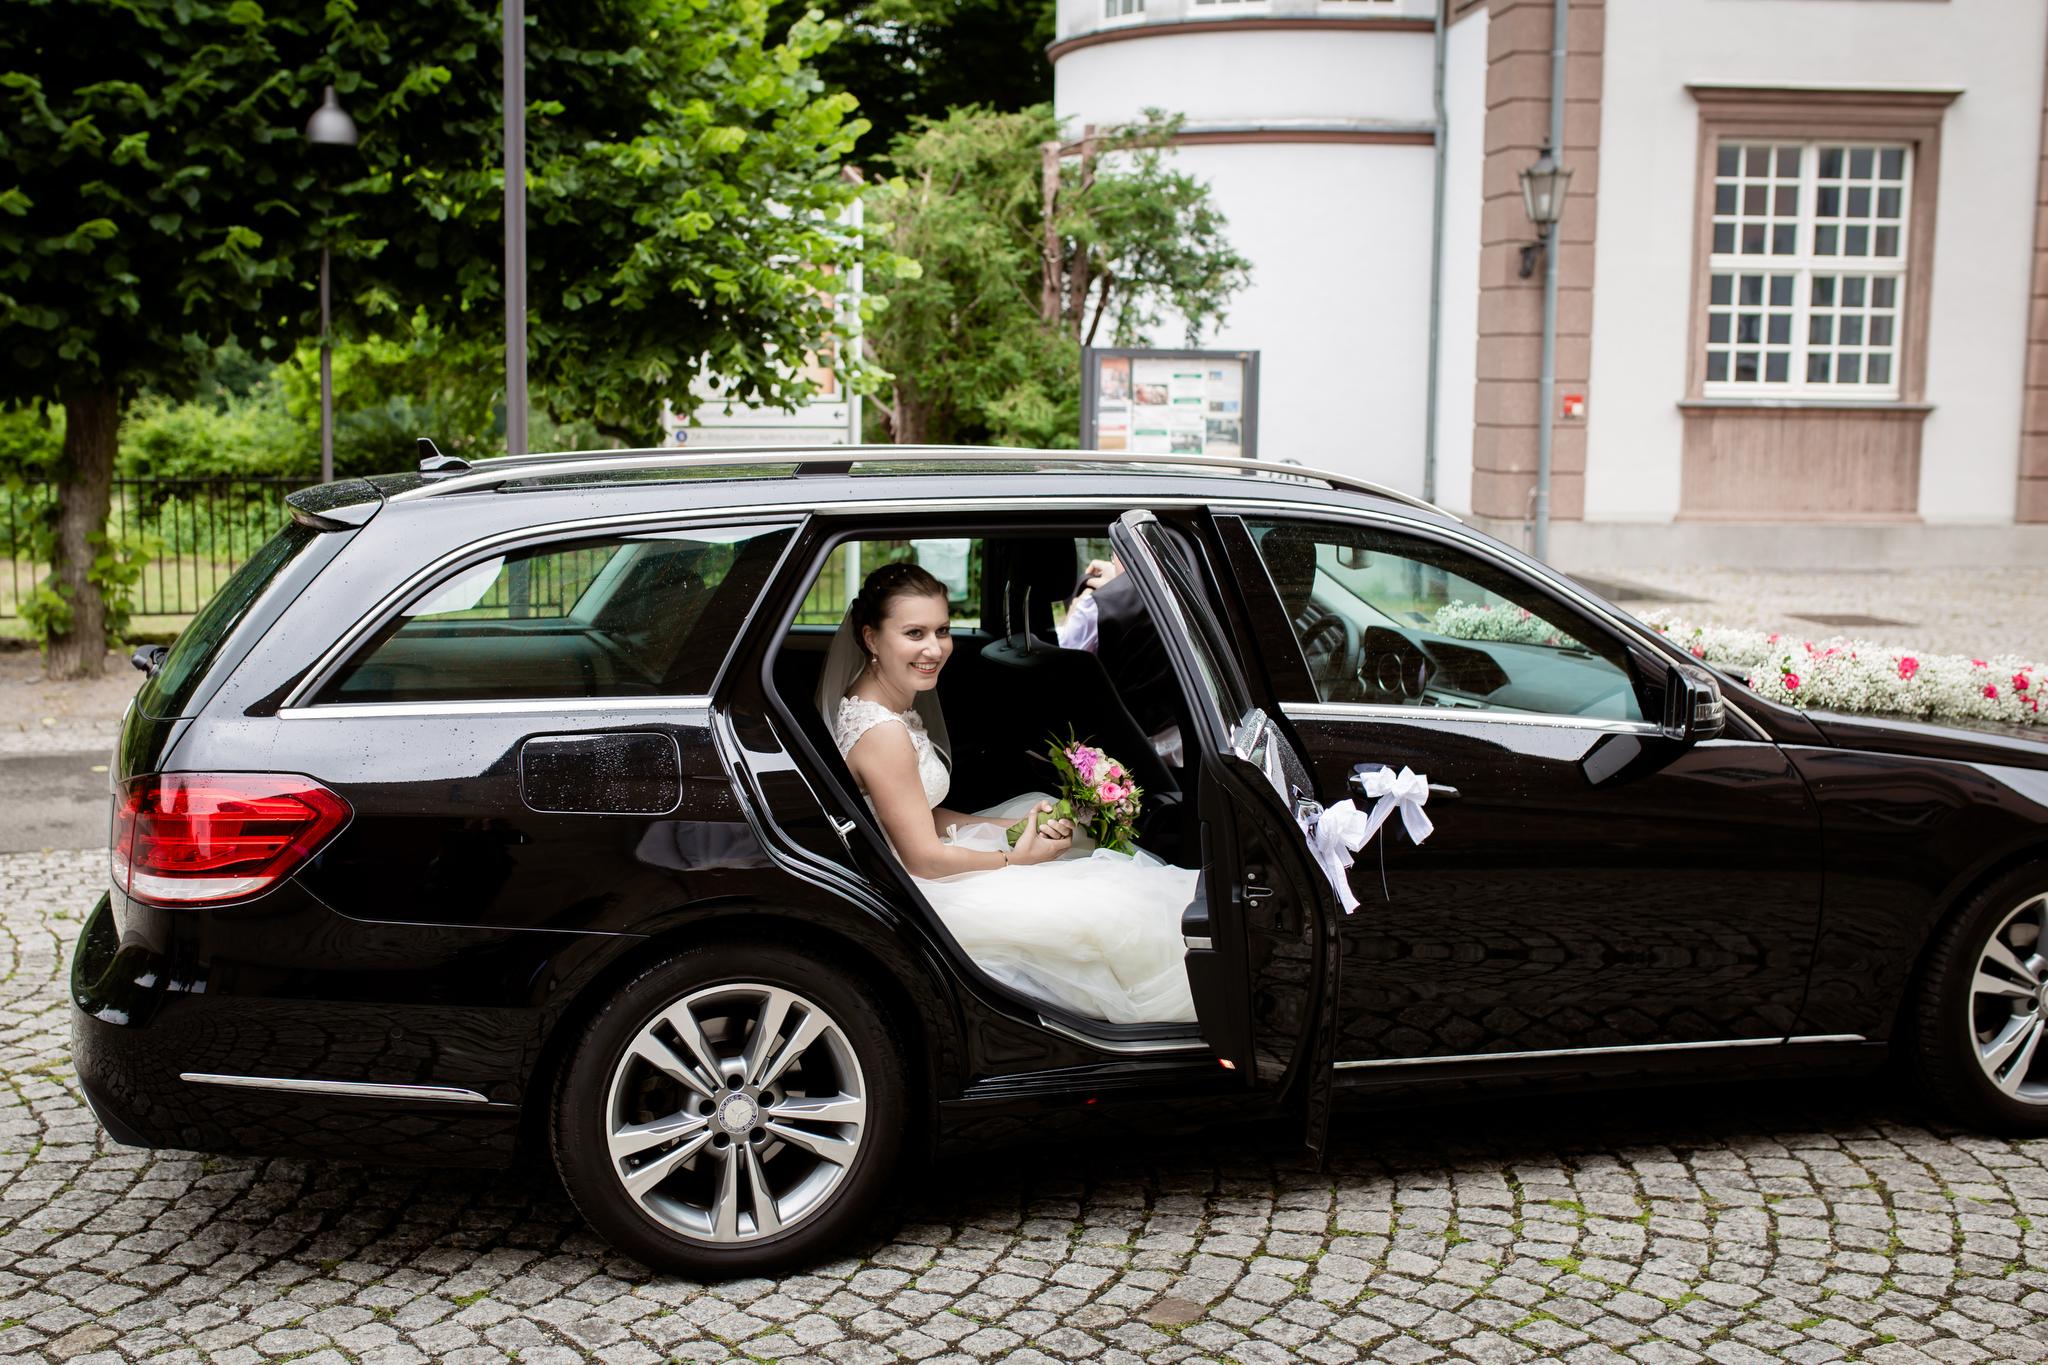 Claudia Krawinkel Fotografie Hochzeitsfotograf Essen Düsseldorf Dormagen Kloster Knechtsteden Hochzeitsreportage Hochzeit Knechtsteden42